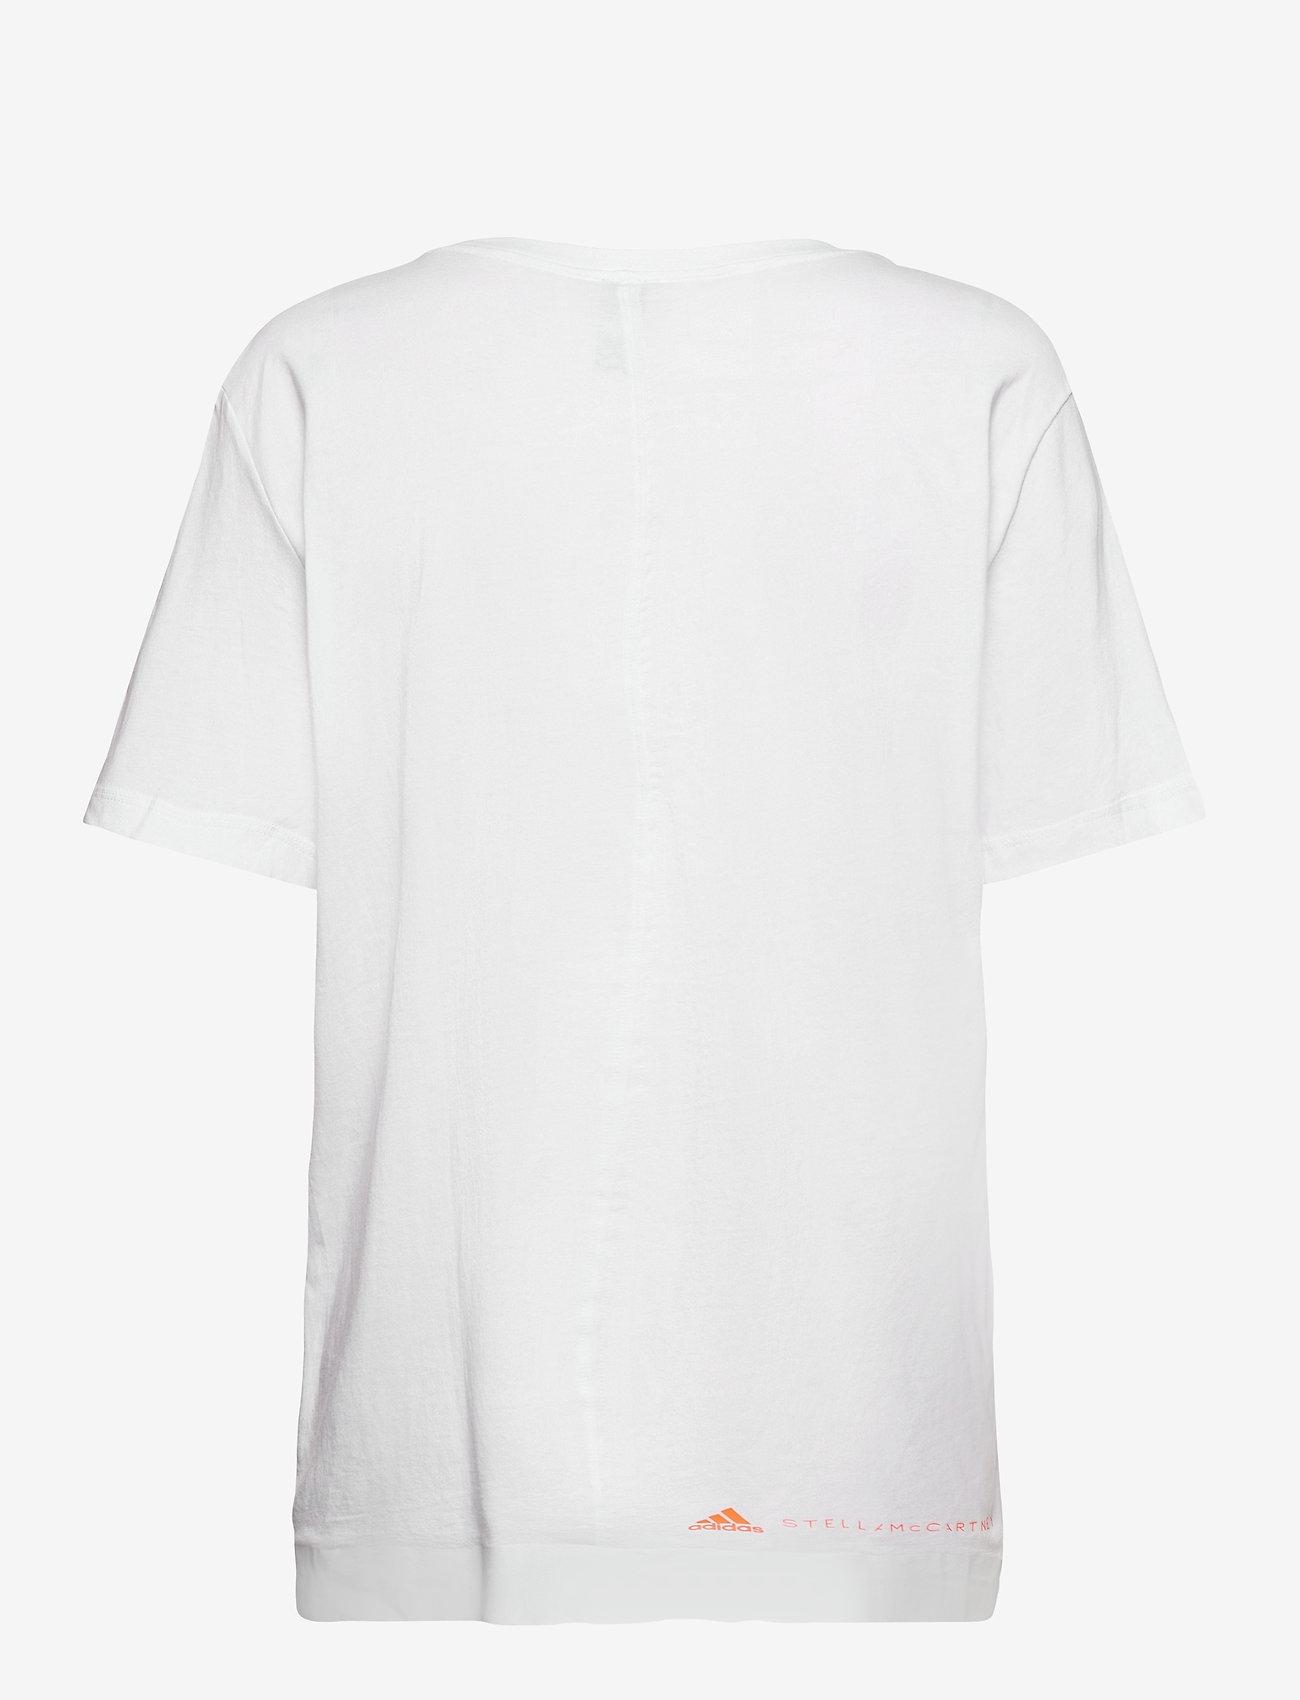 adidas by Stella McCartney - COTTON TEE - t-shirts - white - 1